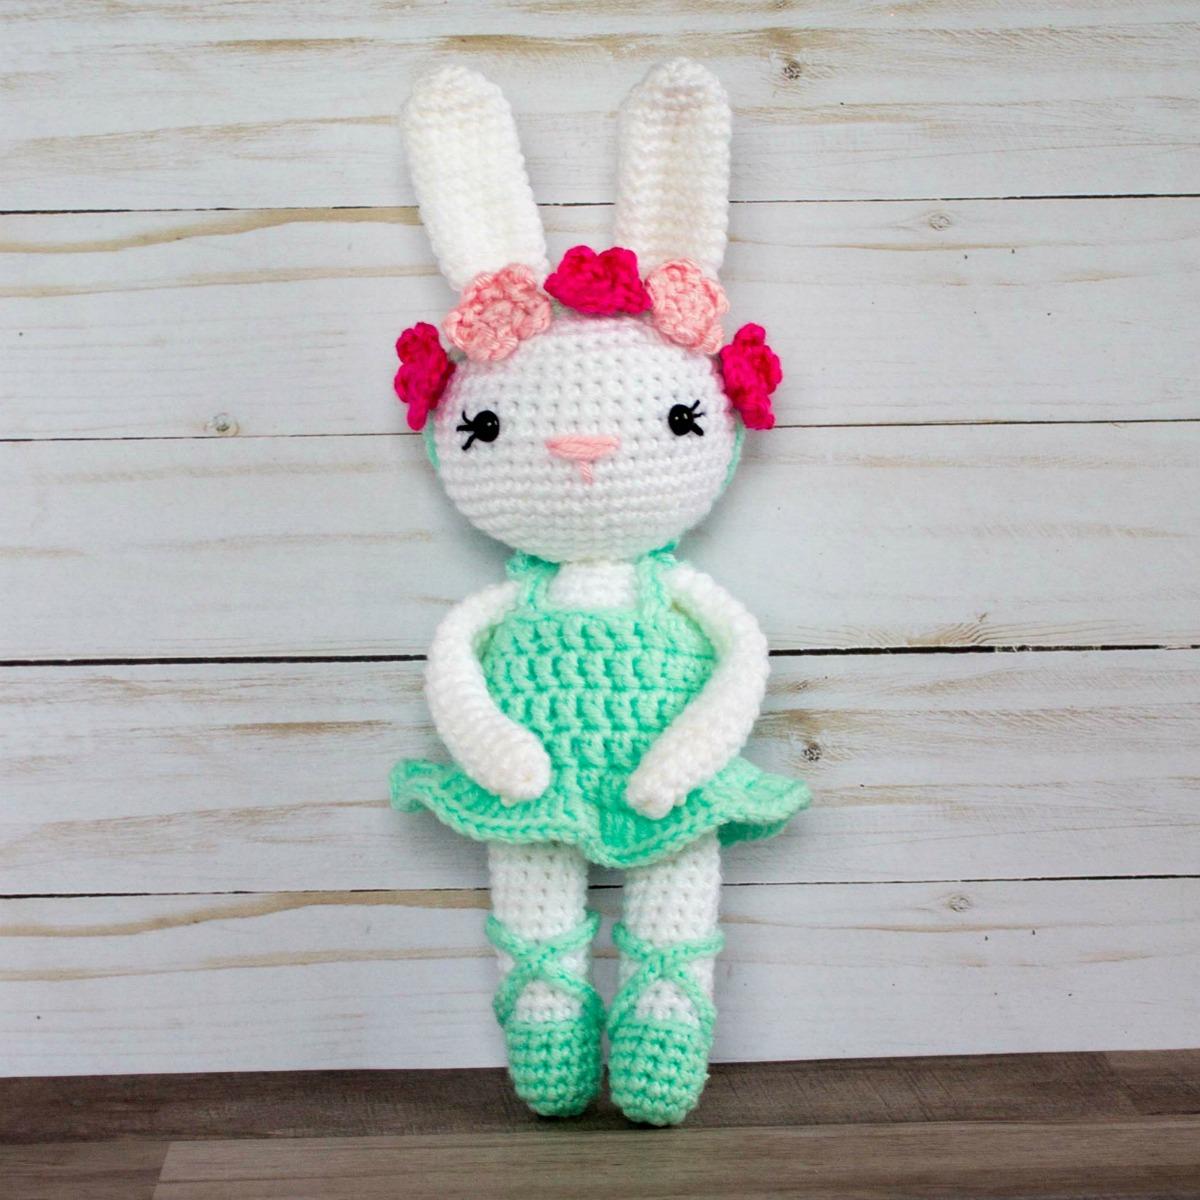 Crochet Unicorn Toy For Girl Mini Knit Animal Amigurumi Baby | Etsy | 1200x1200